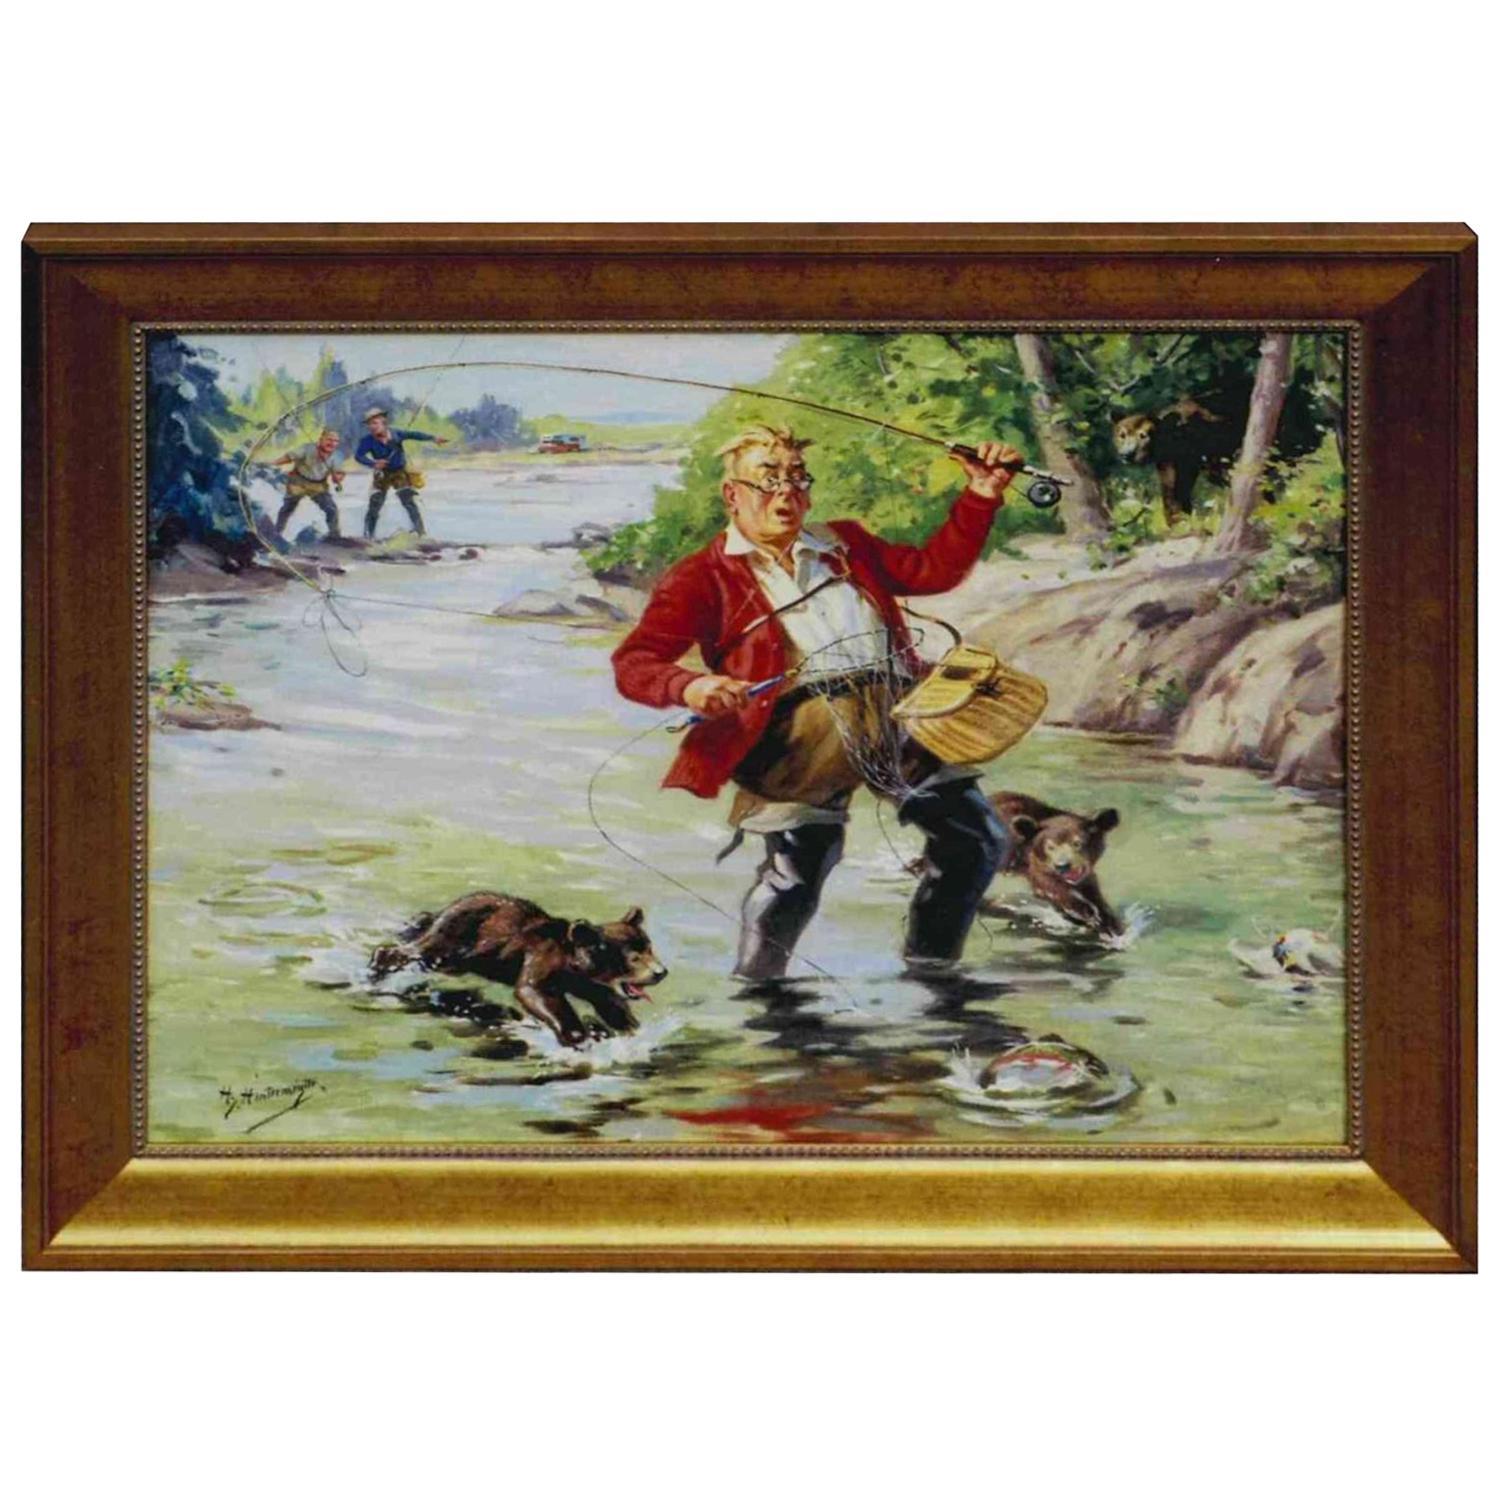 Winner Takes All Original Oil Painting by Henry Hintermeister